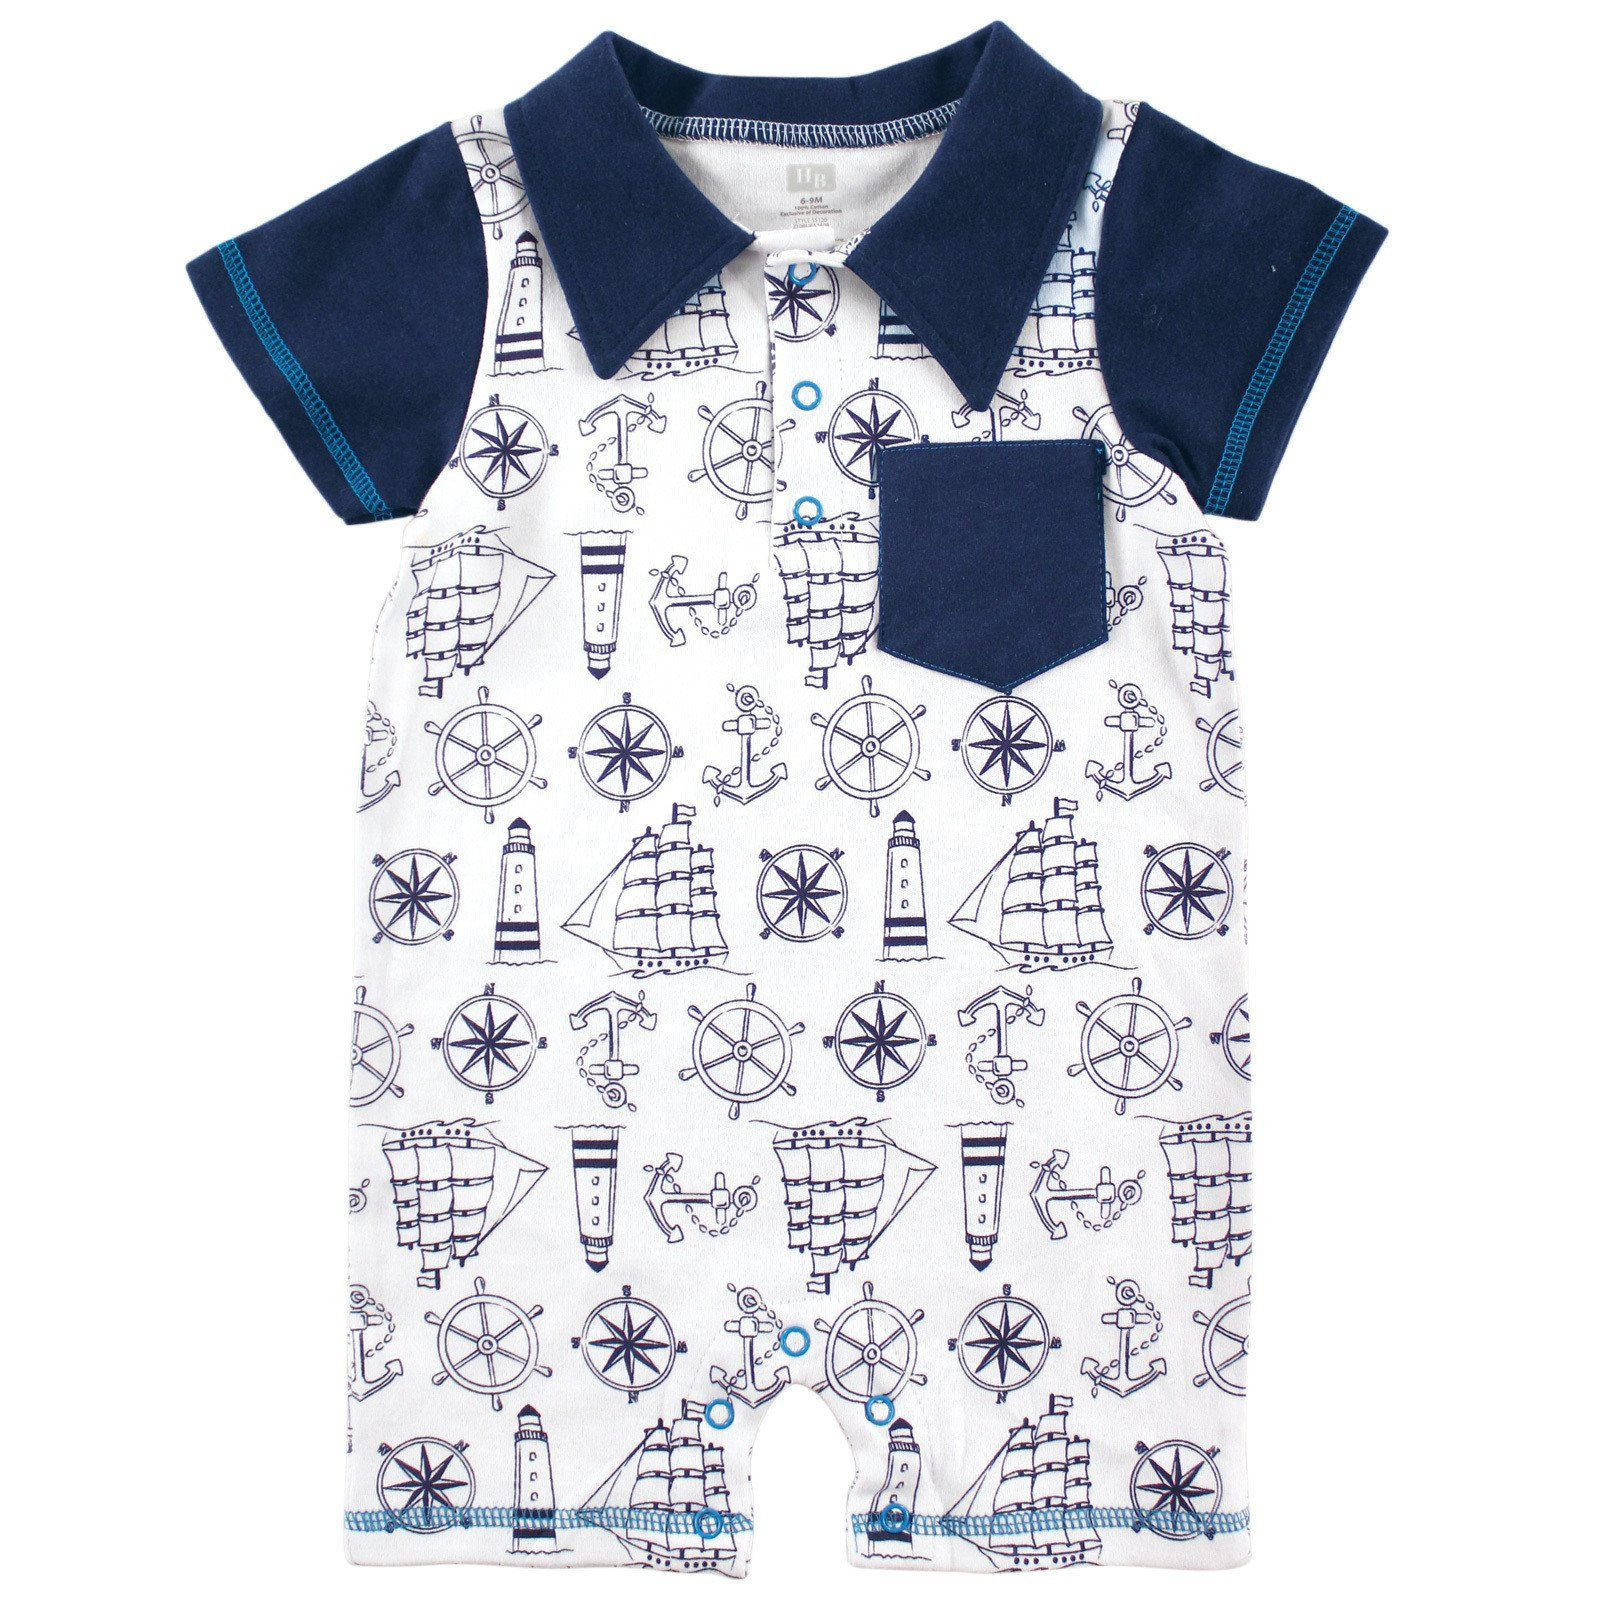 Hudson Baby Summer Romper Nautical Print 3 6 Months